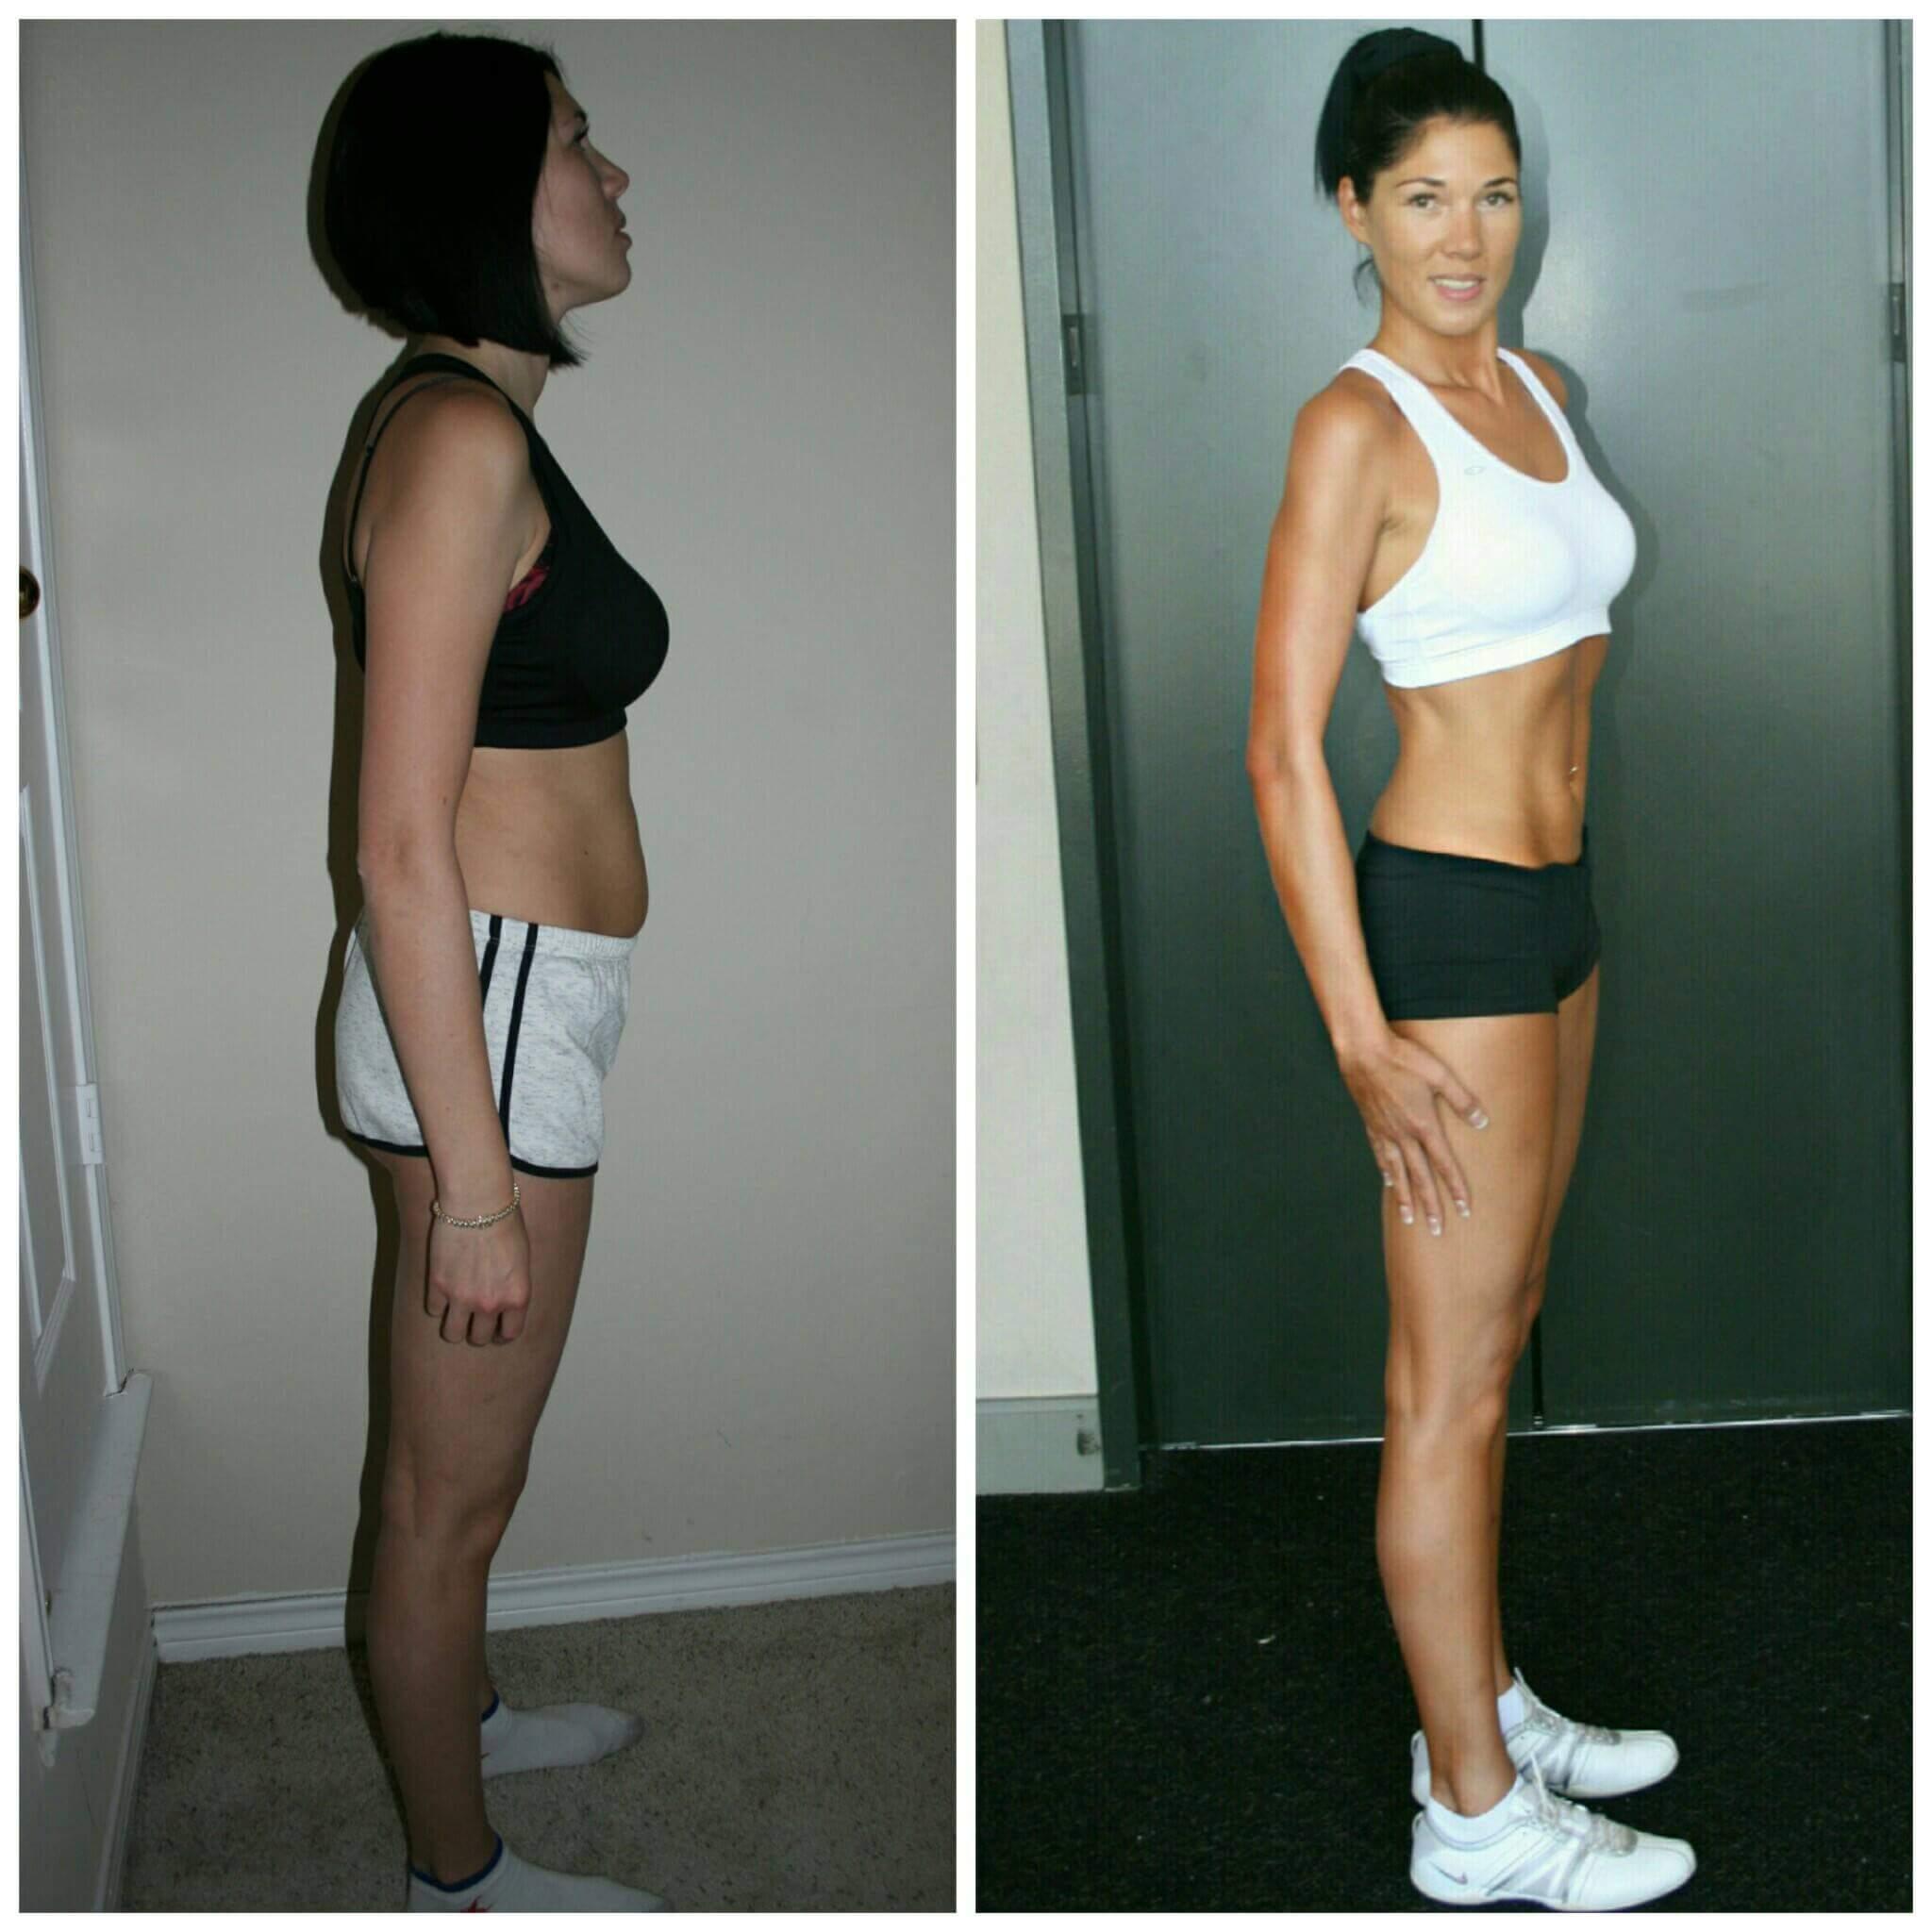 Tanya muscle toning personal trainer Dallas